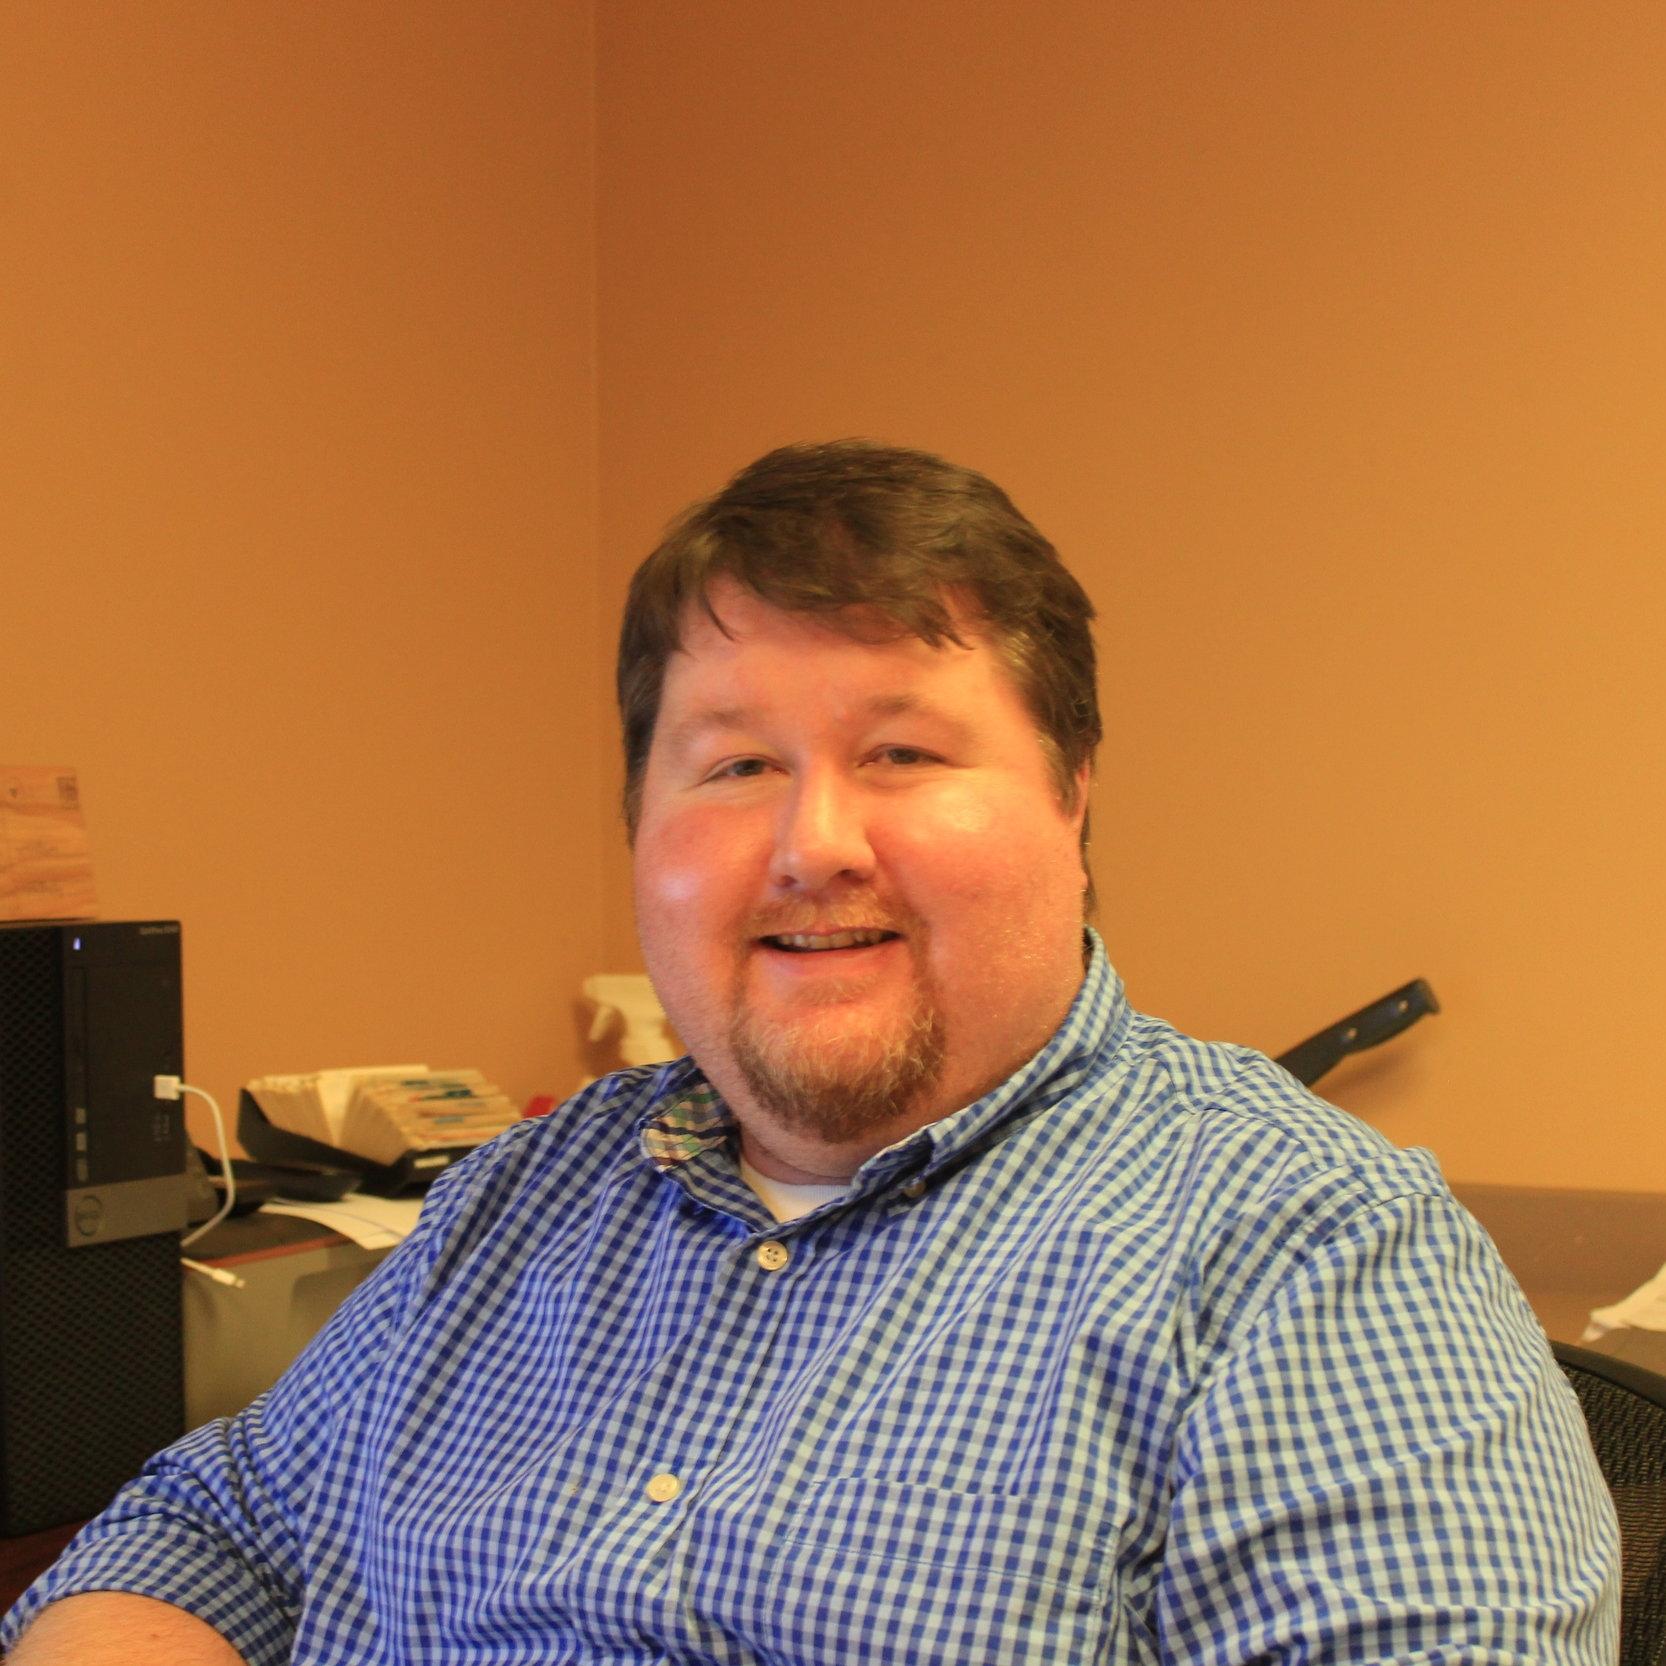 William Marshall, Senior Estimator/ Project Manager